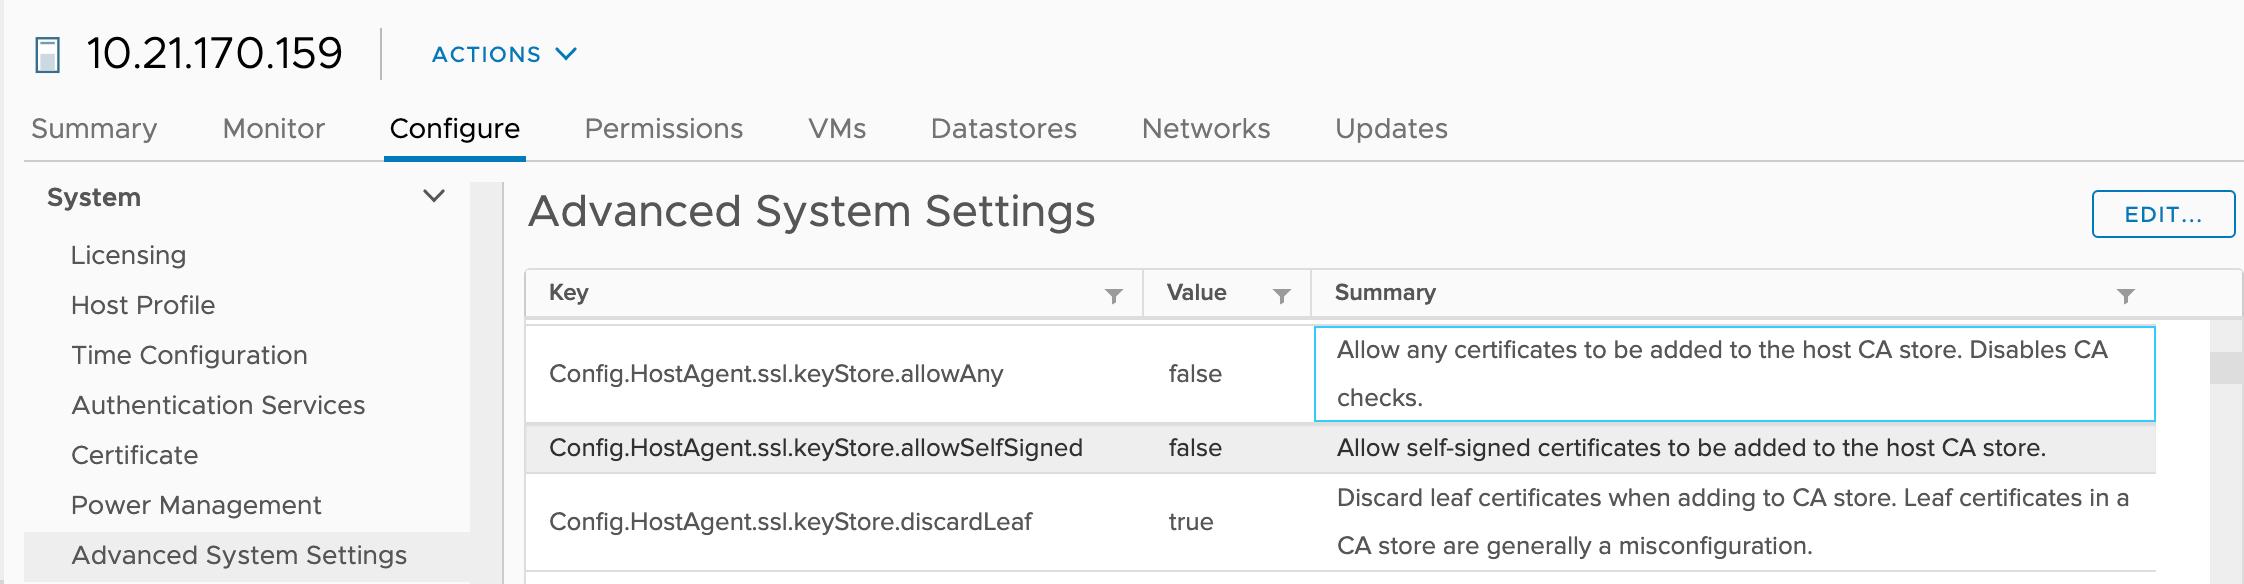 Figure 5: Config.HostAgent.ssl.keyStore.allowSelfSignedFigure 5: Config.HostAgent.ssl.keyStore.allowSelfSigned